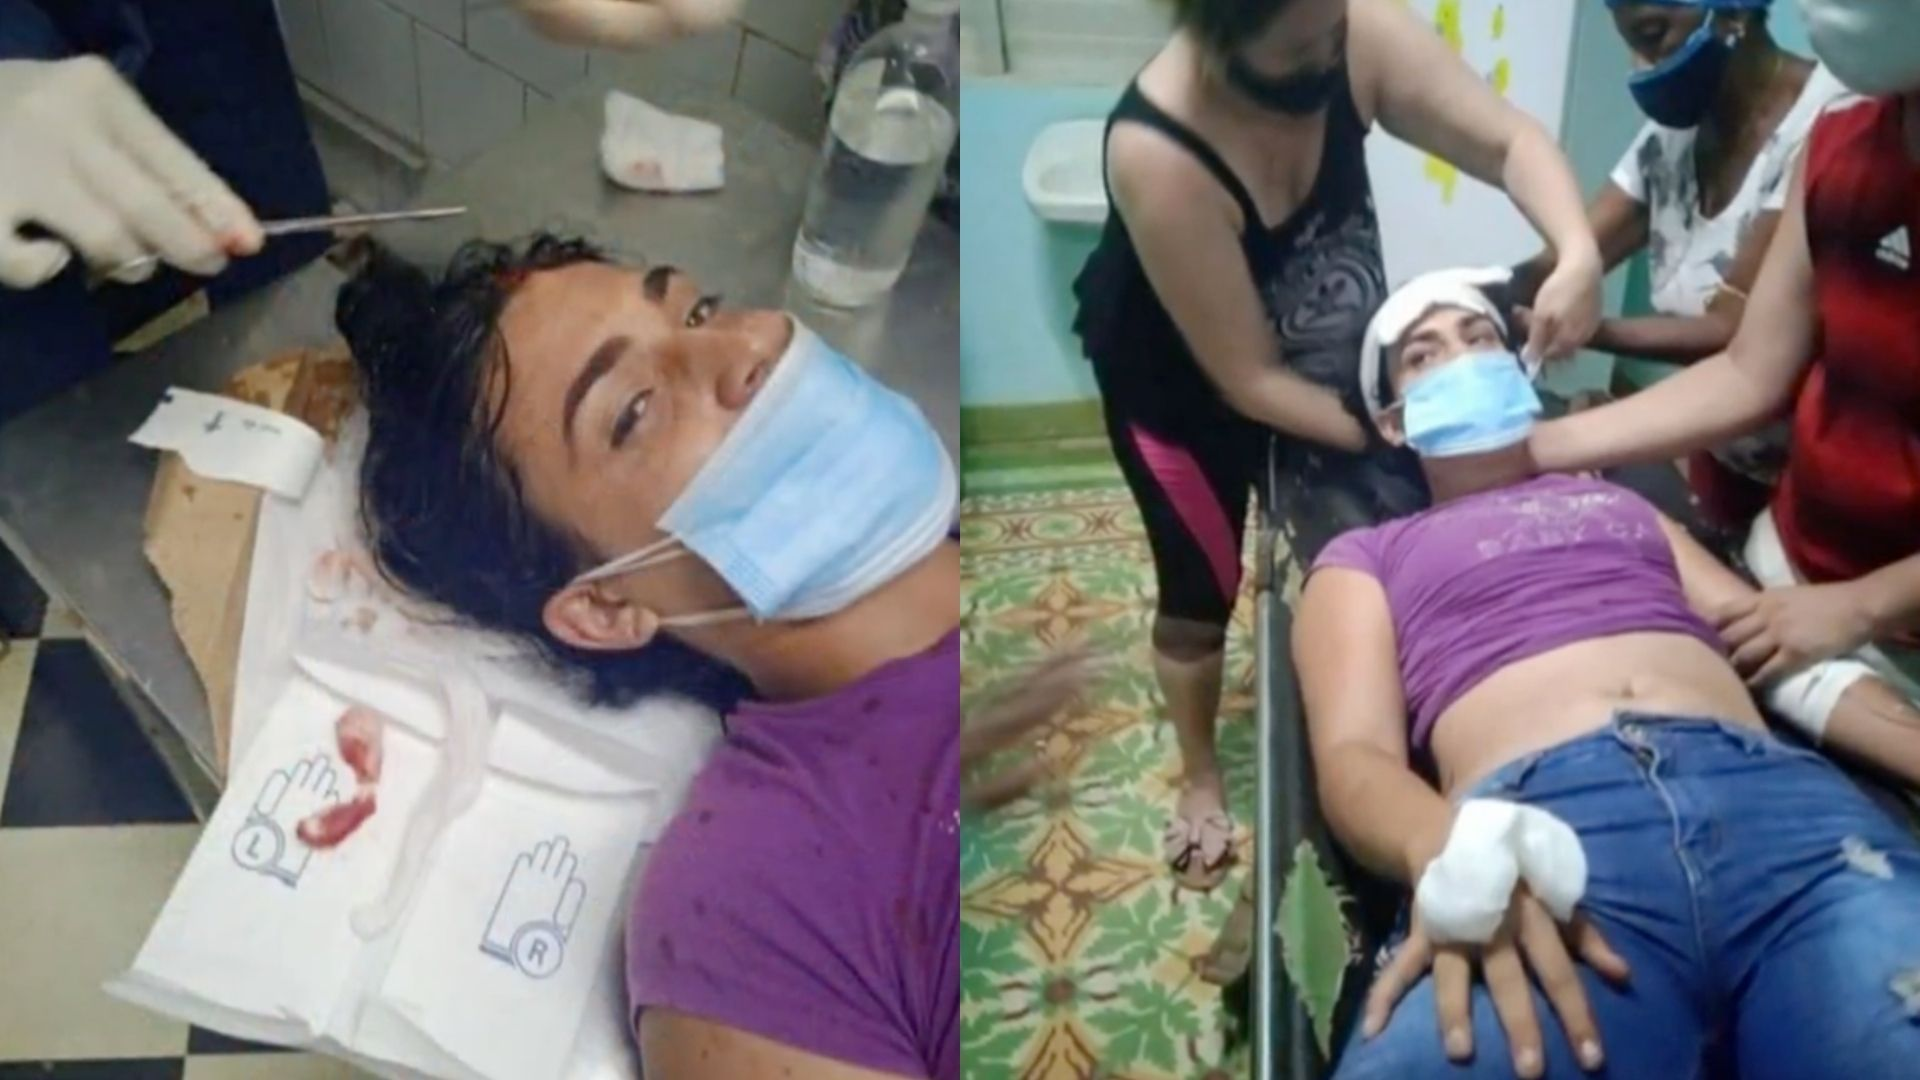 regimen busca condenar a seis anos de prision a dama de blanco tras rebelion en cuba